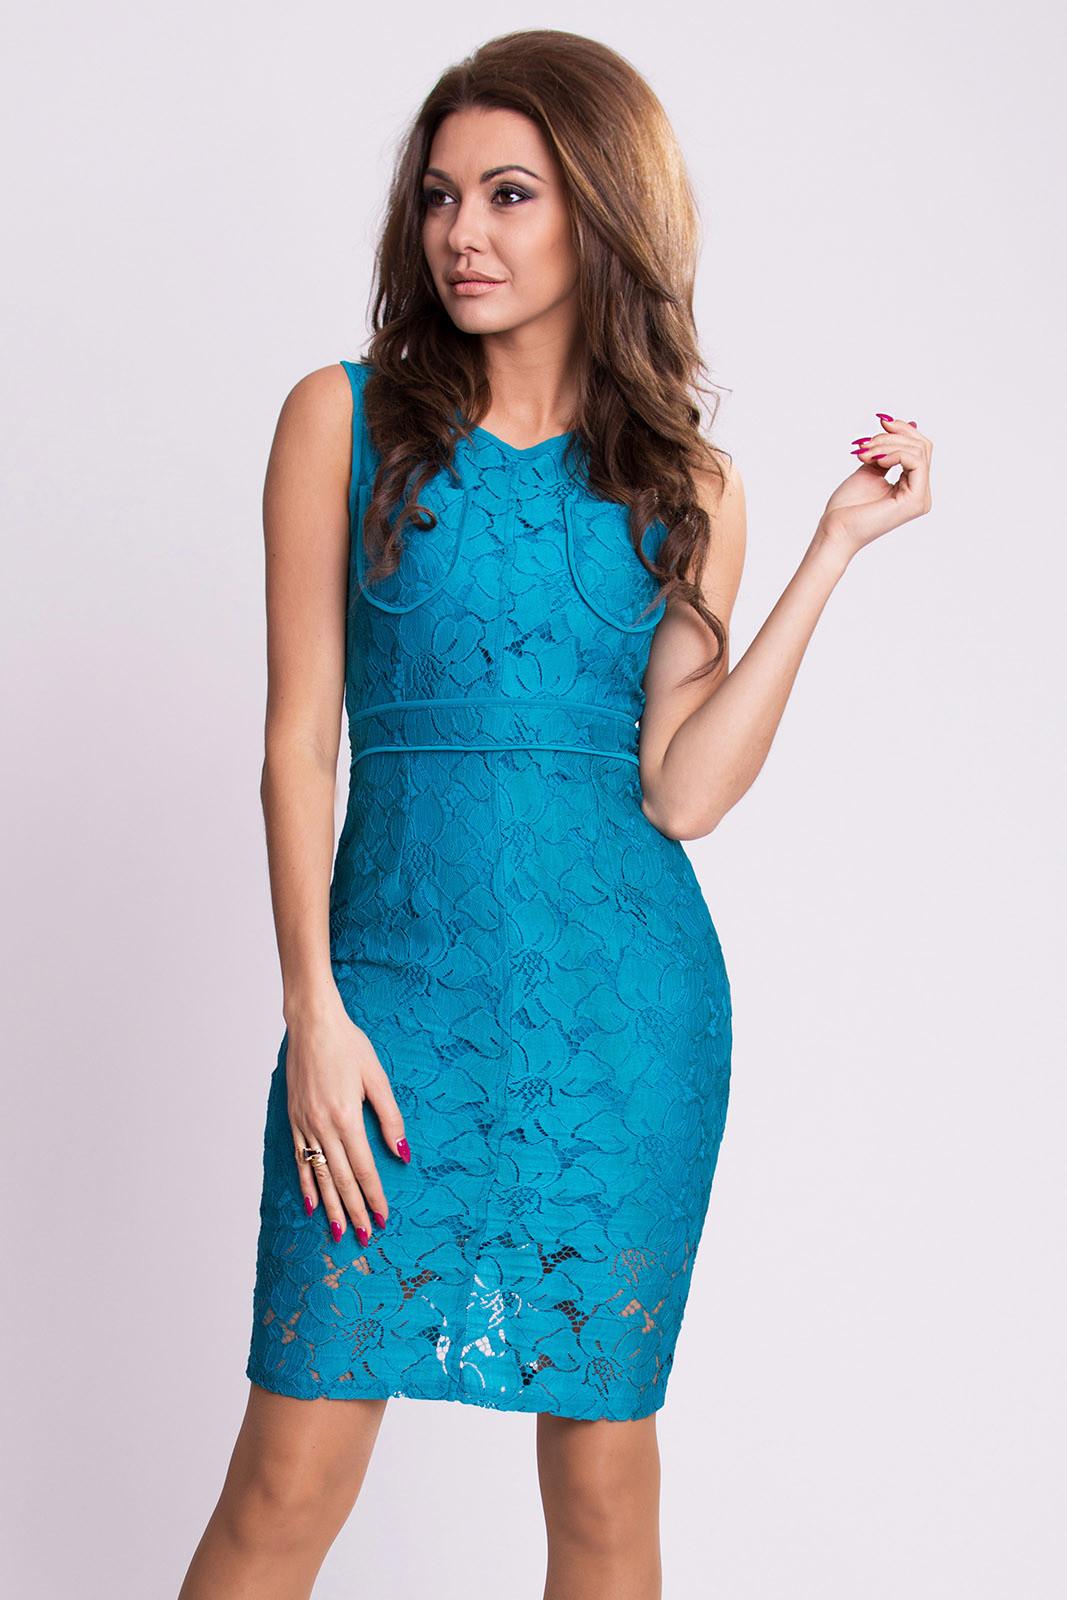 Dámské krajkové šaty EMAMODA modré - Modrá / S - EMAMODA modrá S